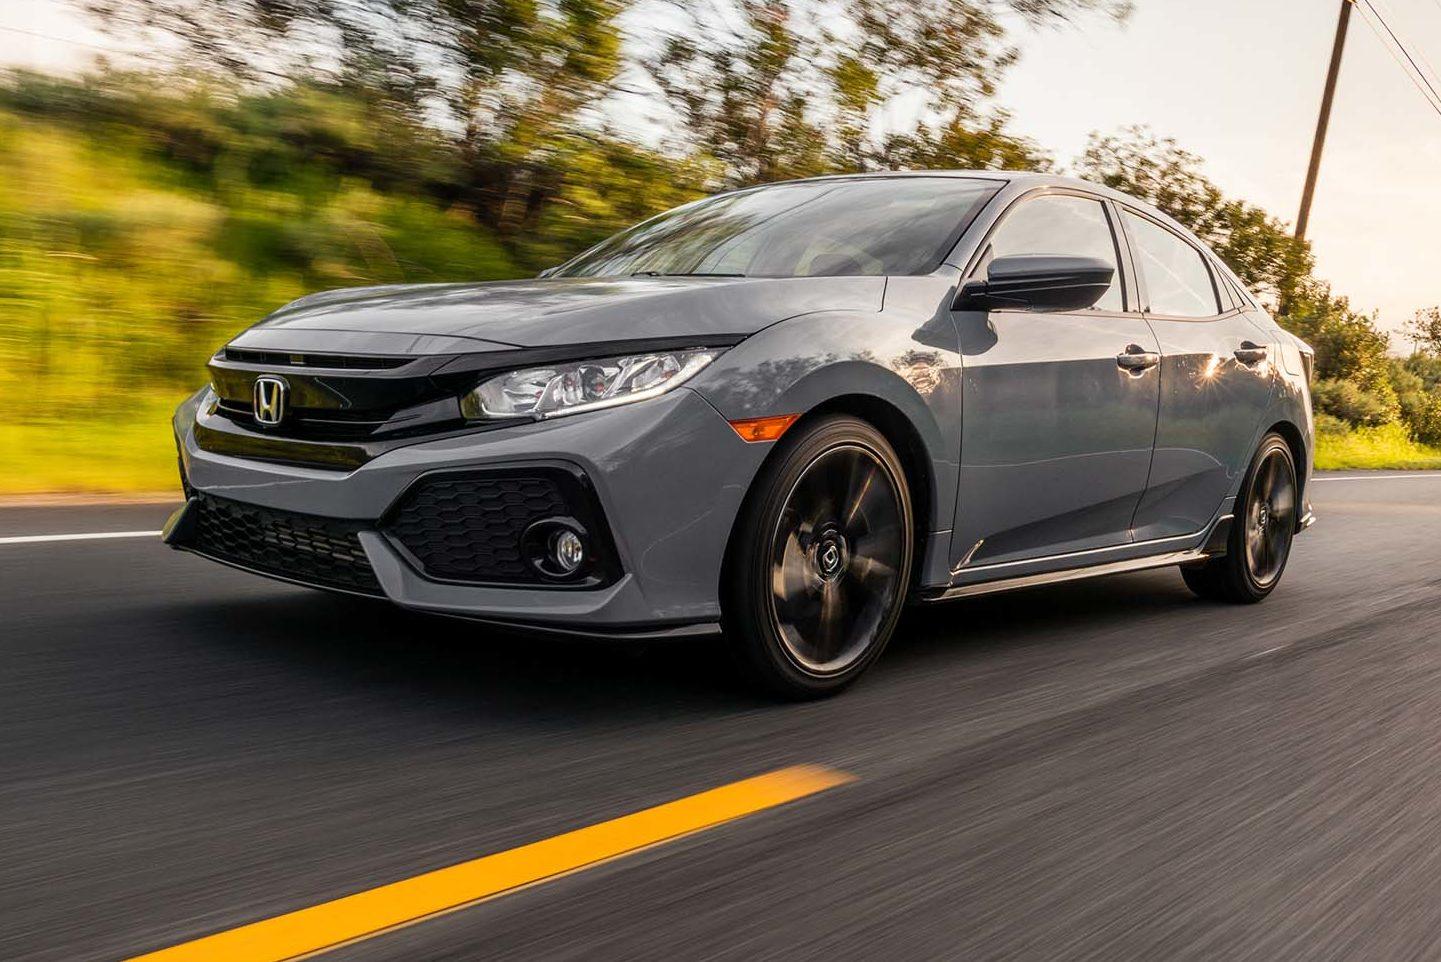 2017 Honda Civic Hatchback Sport Front Three Quarter In Motion 04 E1491859961506